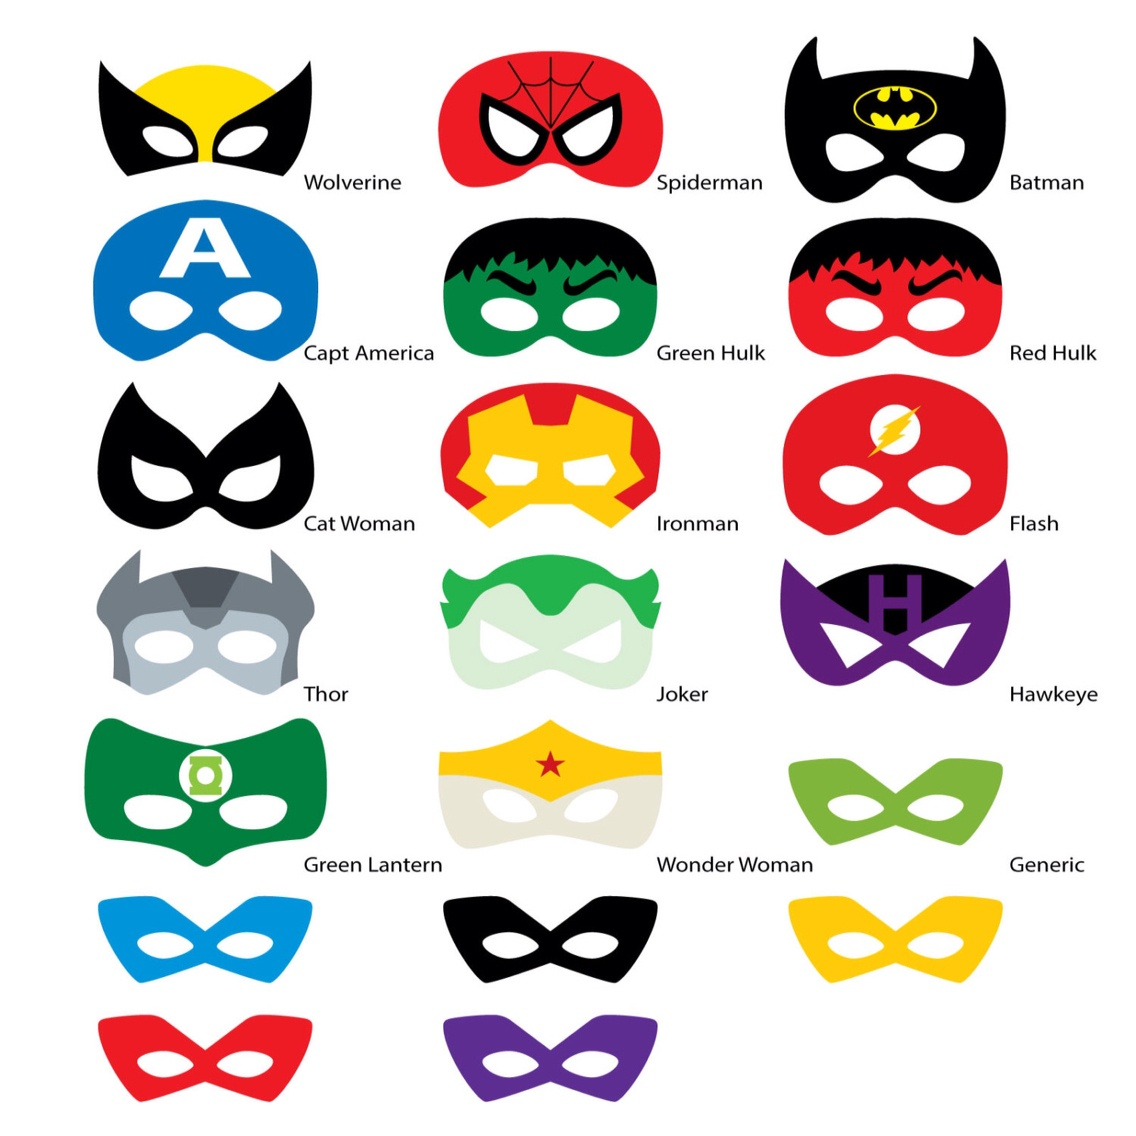 Superhero Mask Template | Free Download Best Superhero Mask Template - Free Superhero Photo Booth Printables